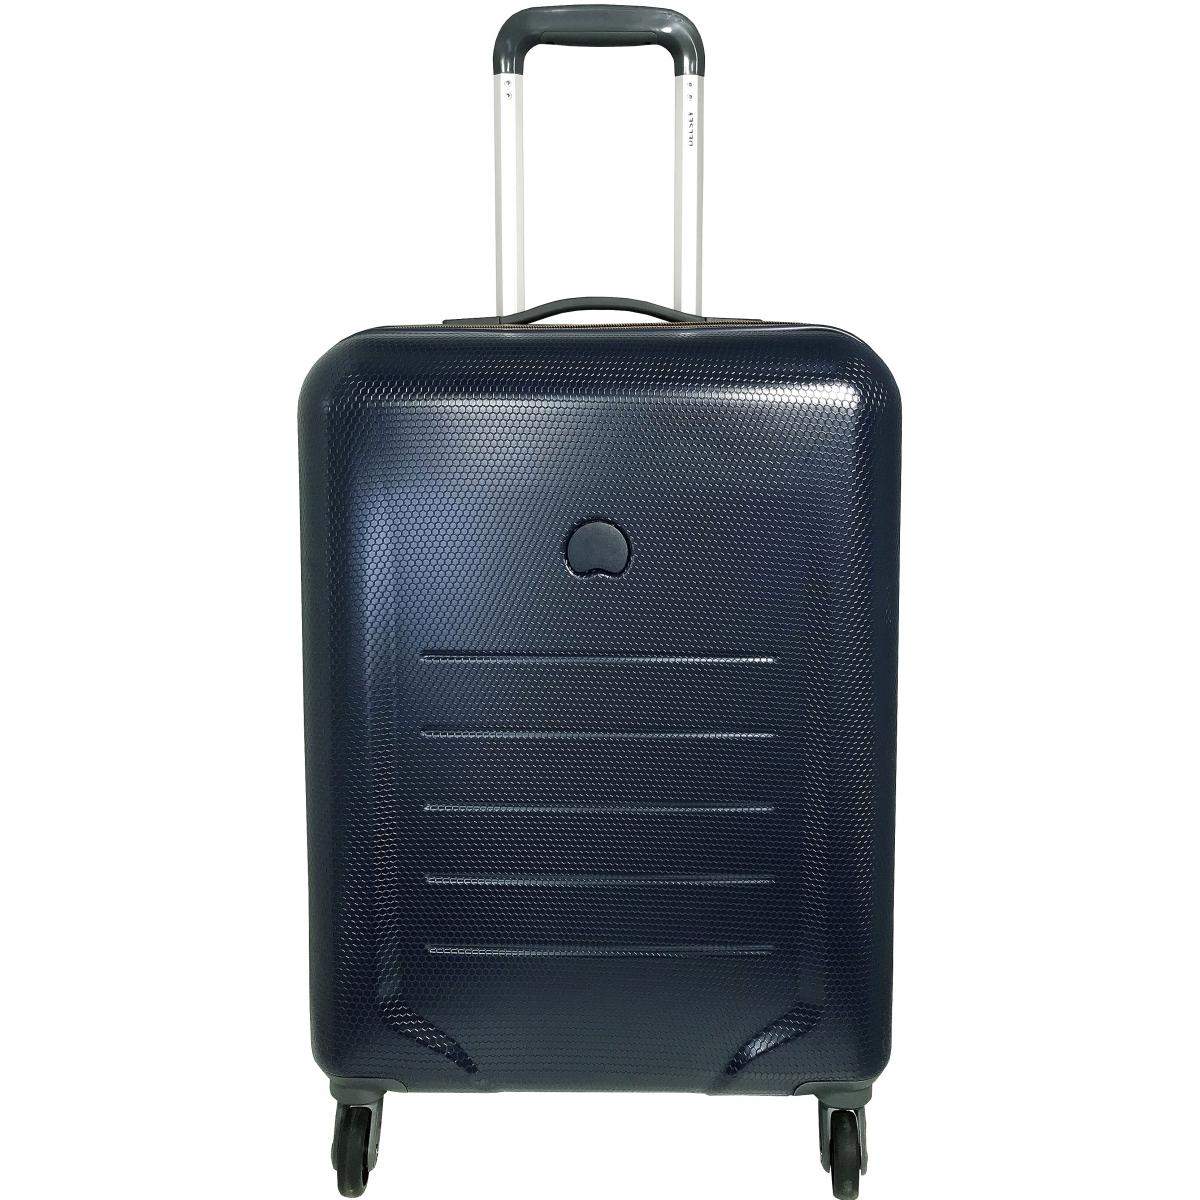 valise cabine rigide delsey toliara 803 tsa abs toliara803 bleu couleur principale bleu